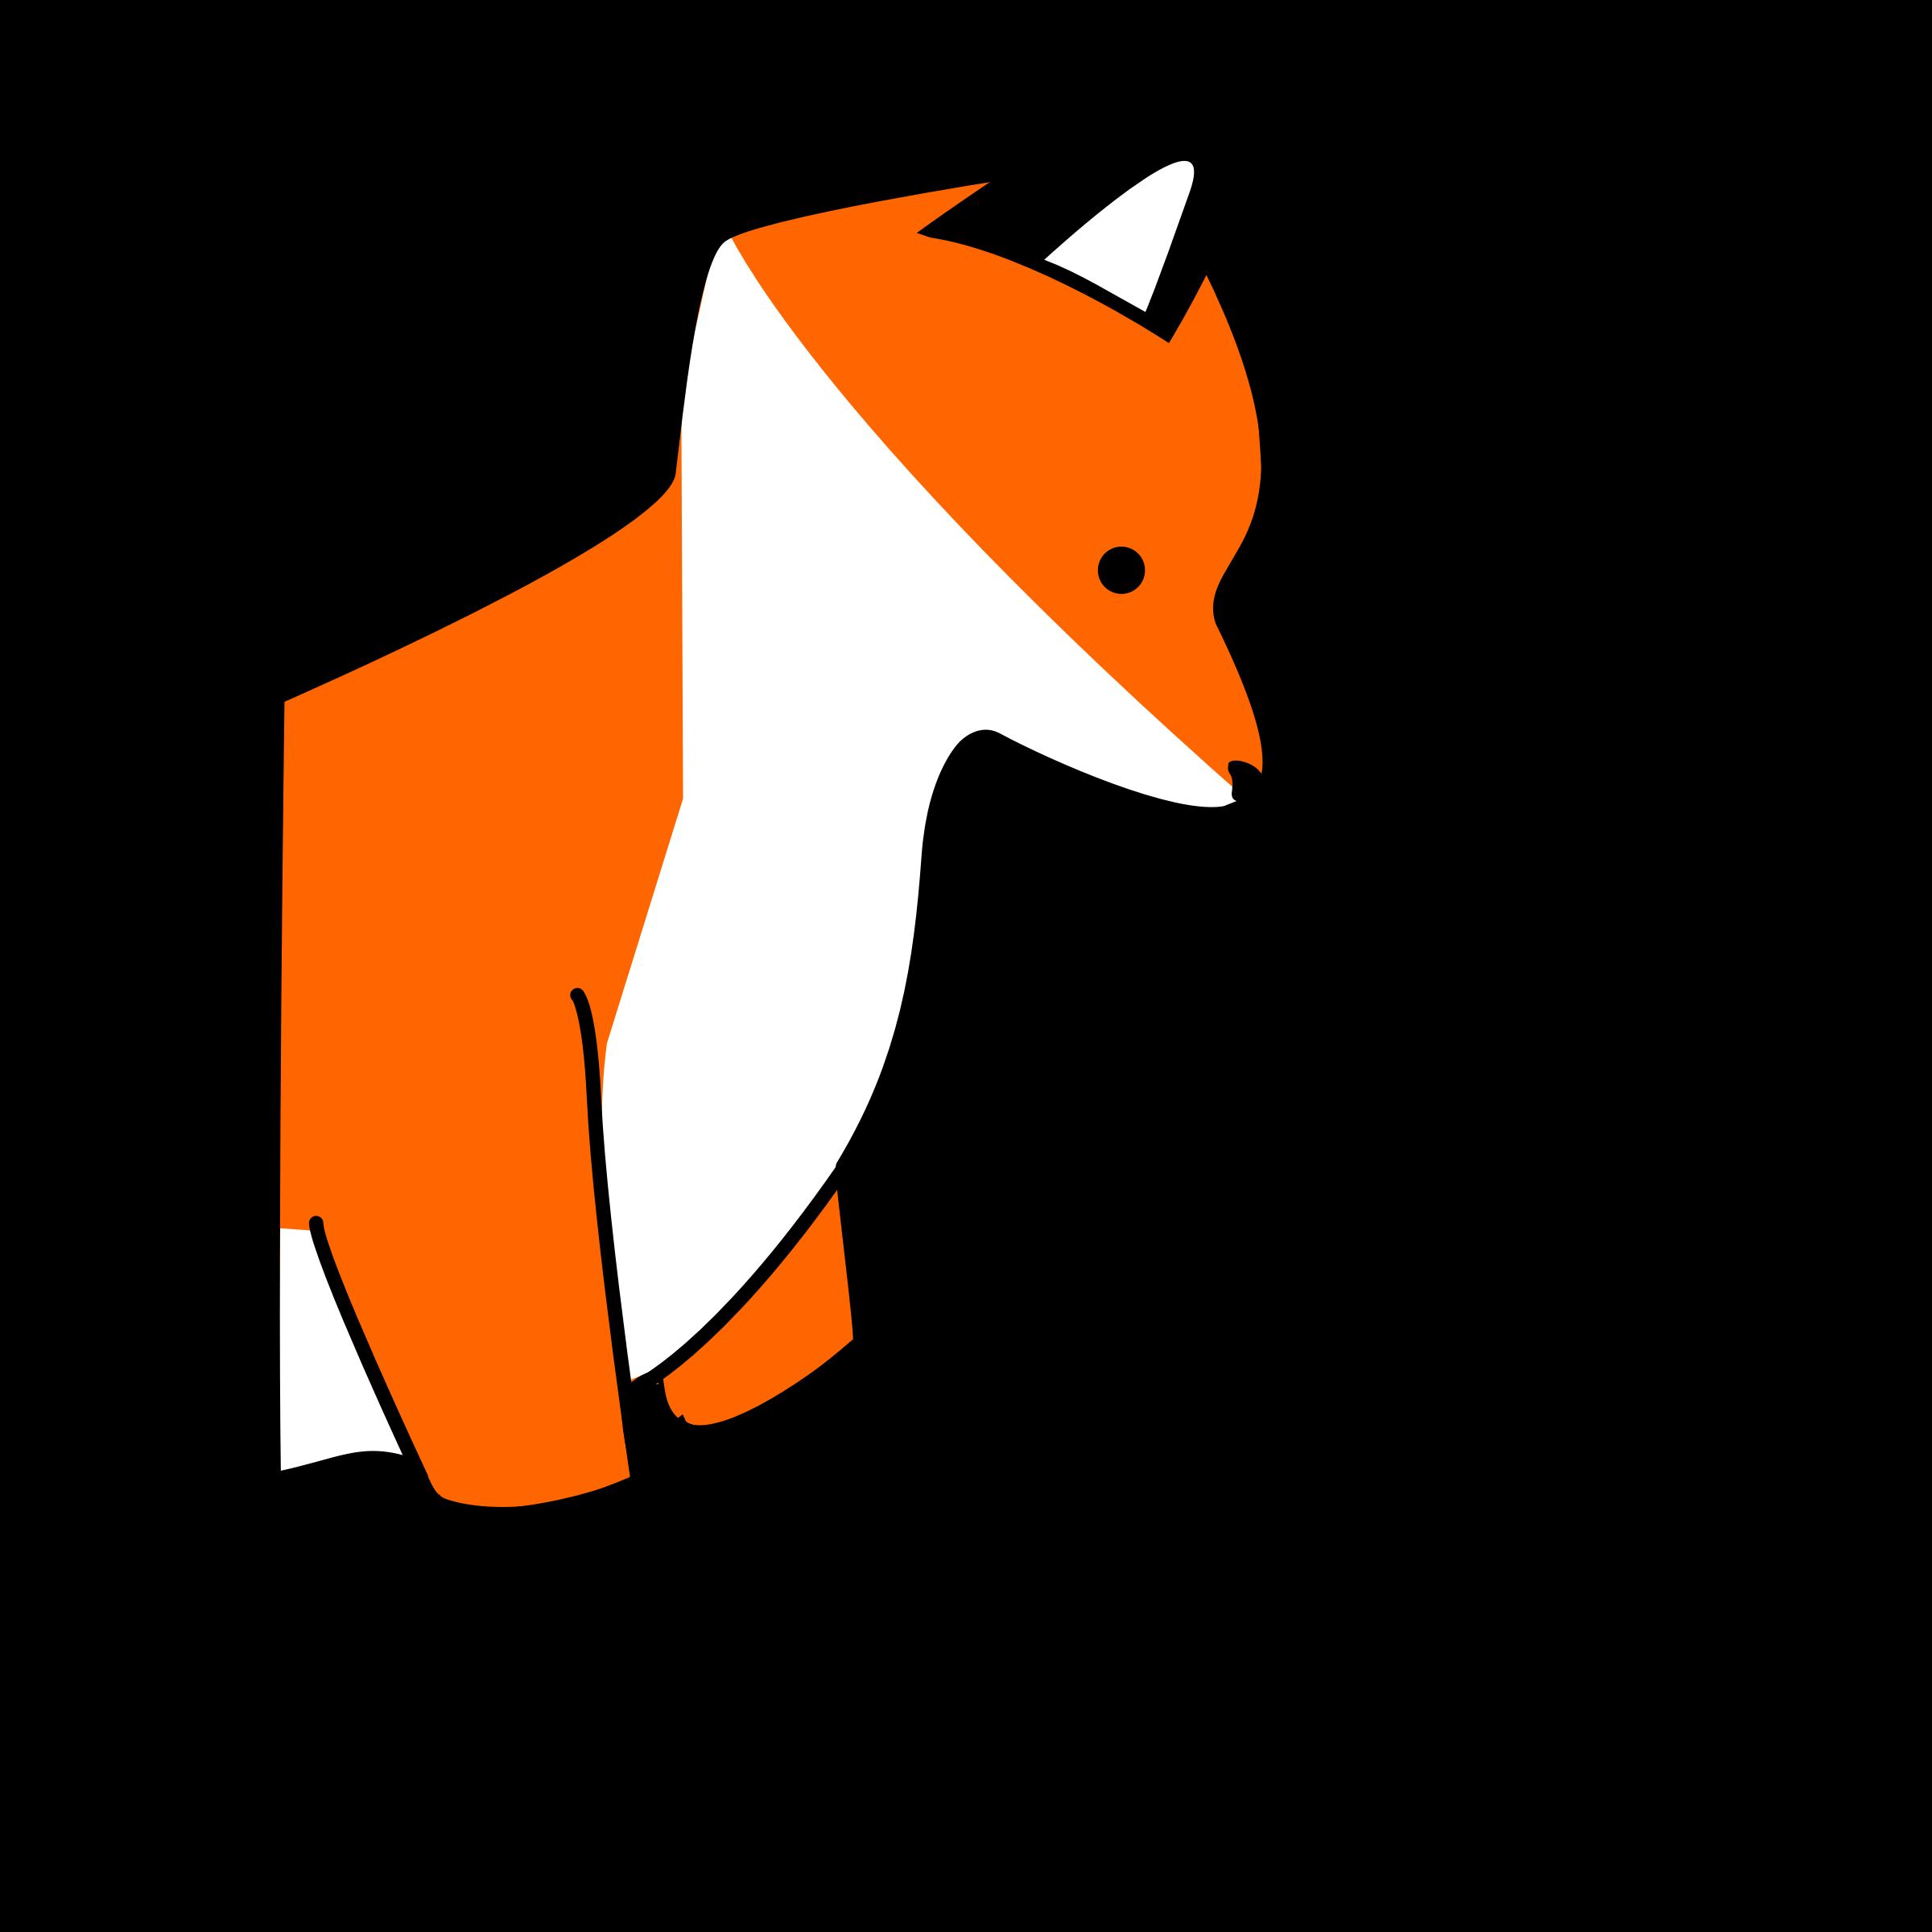 Fox clipart stupid fox - Clipartix picture transparent stock